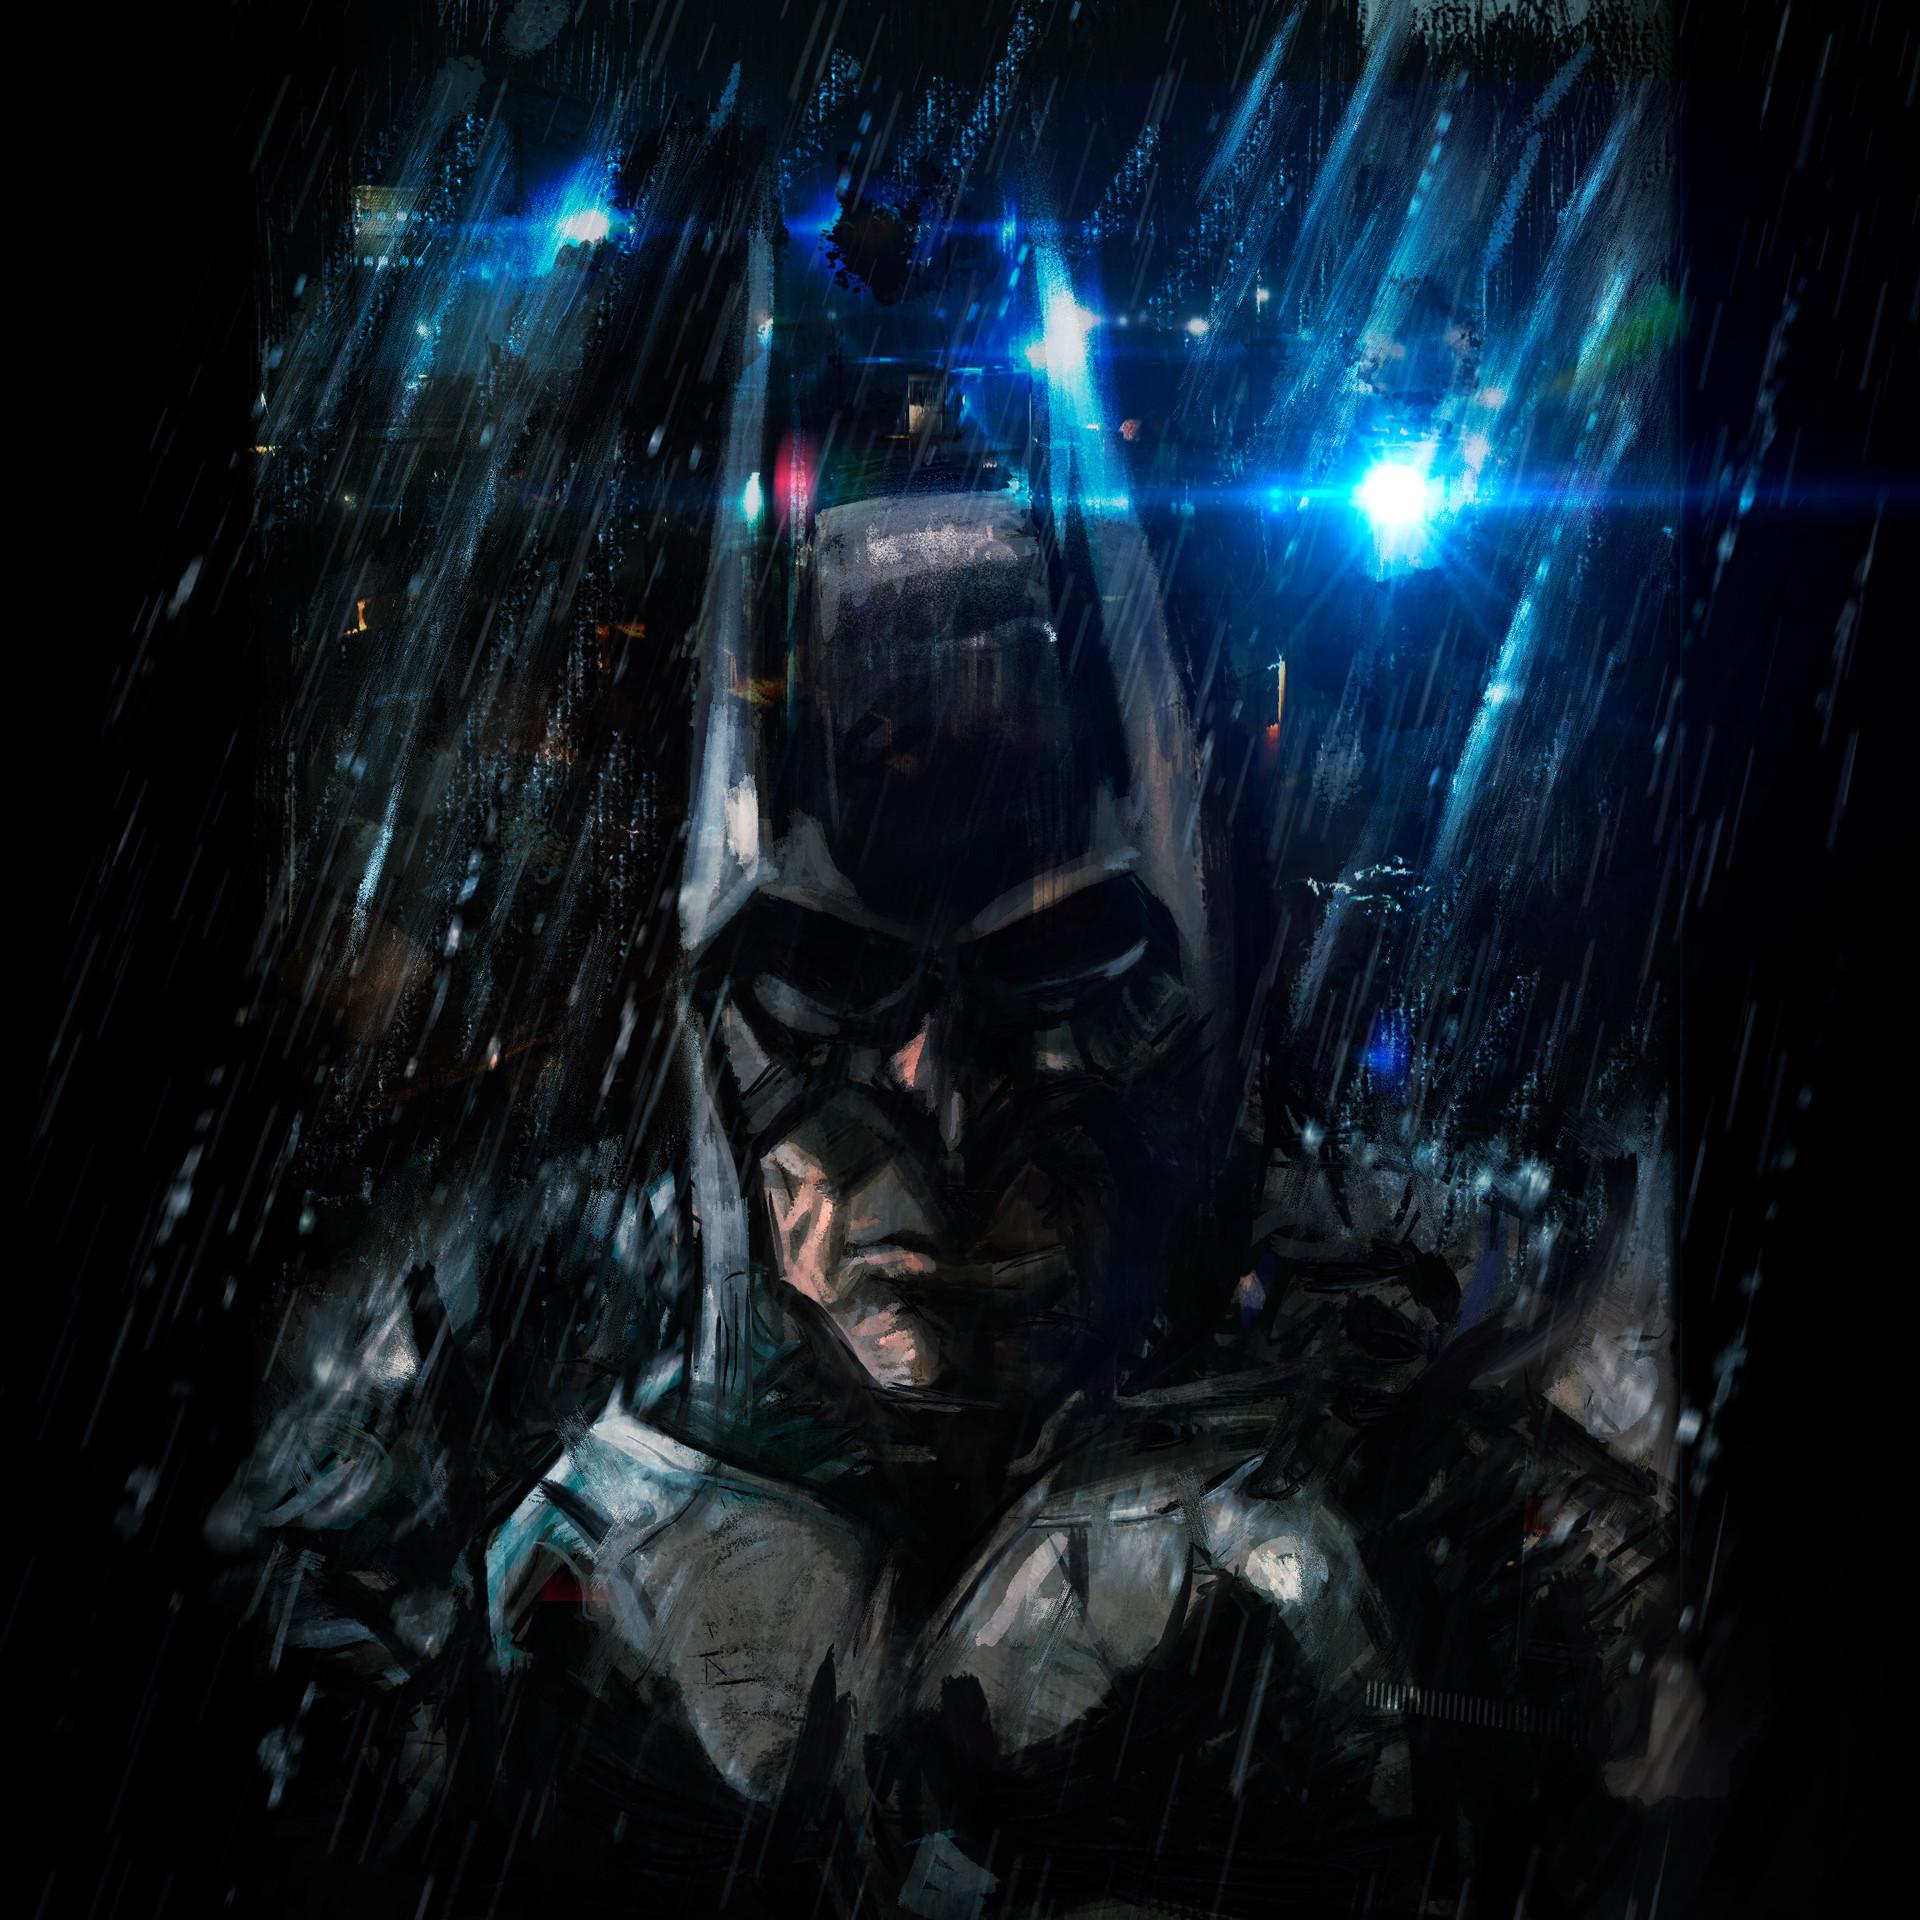 Happy Batmanday 2016